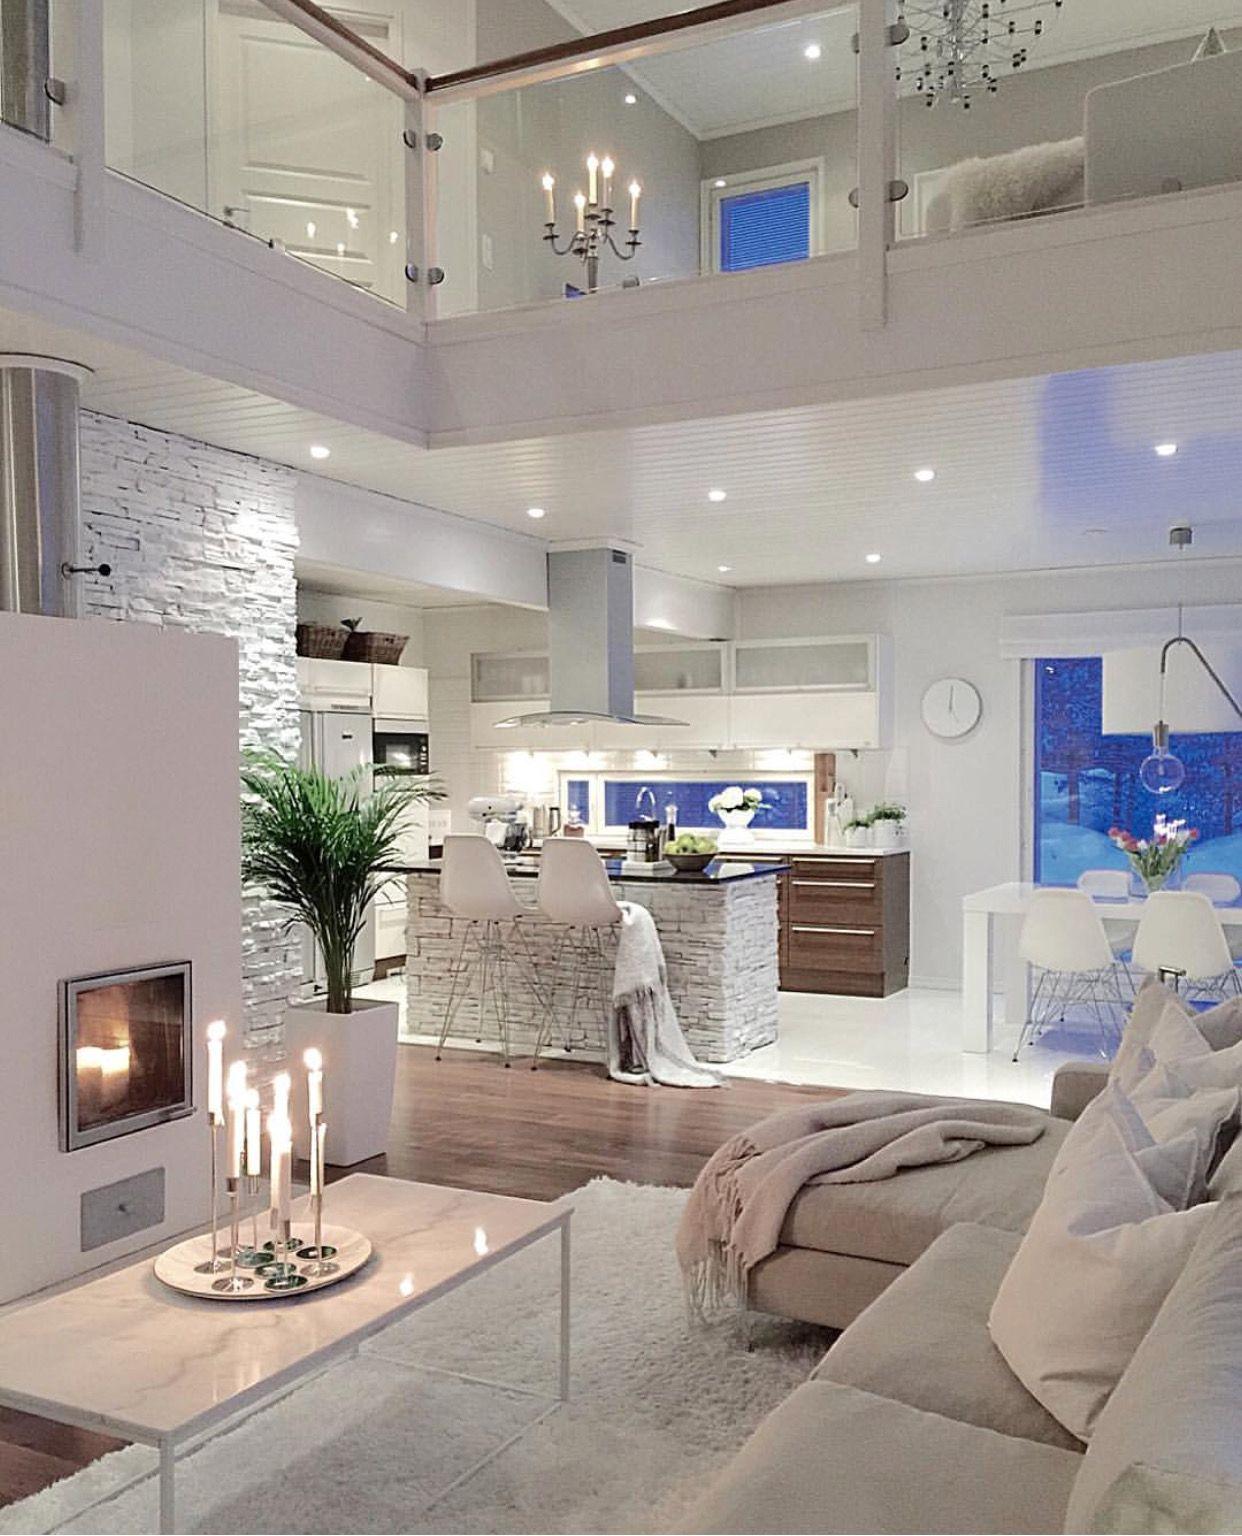 Pin by aftab hingora on dream house - Diseno de escaleras interiores ...